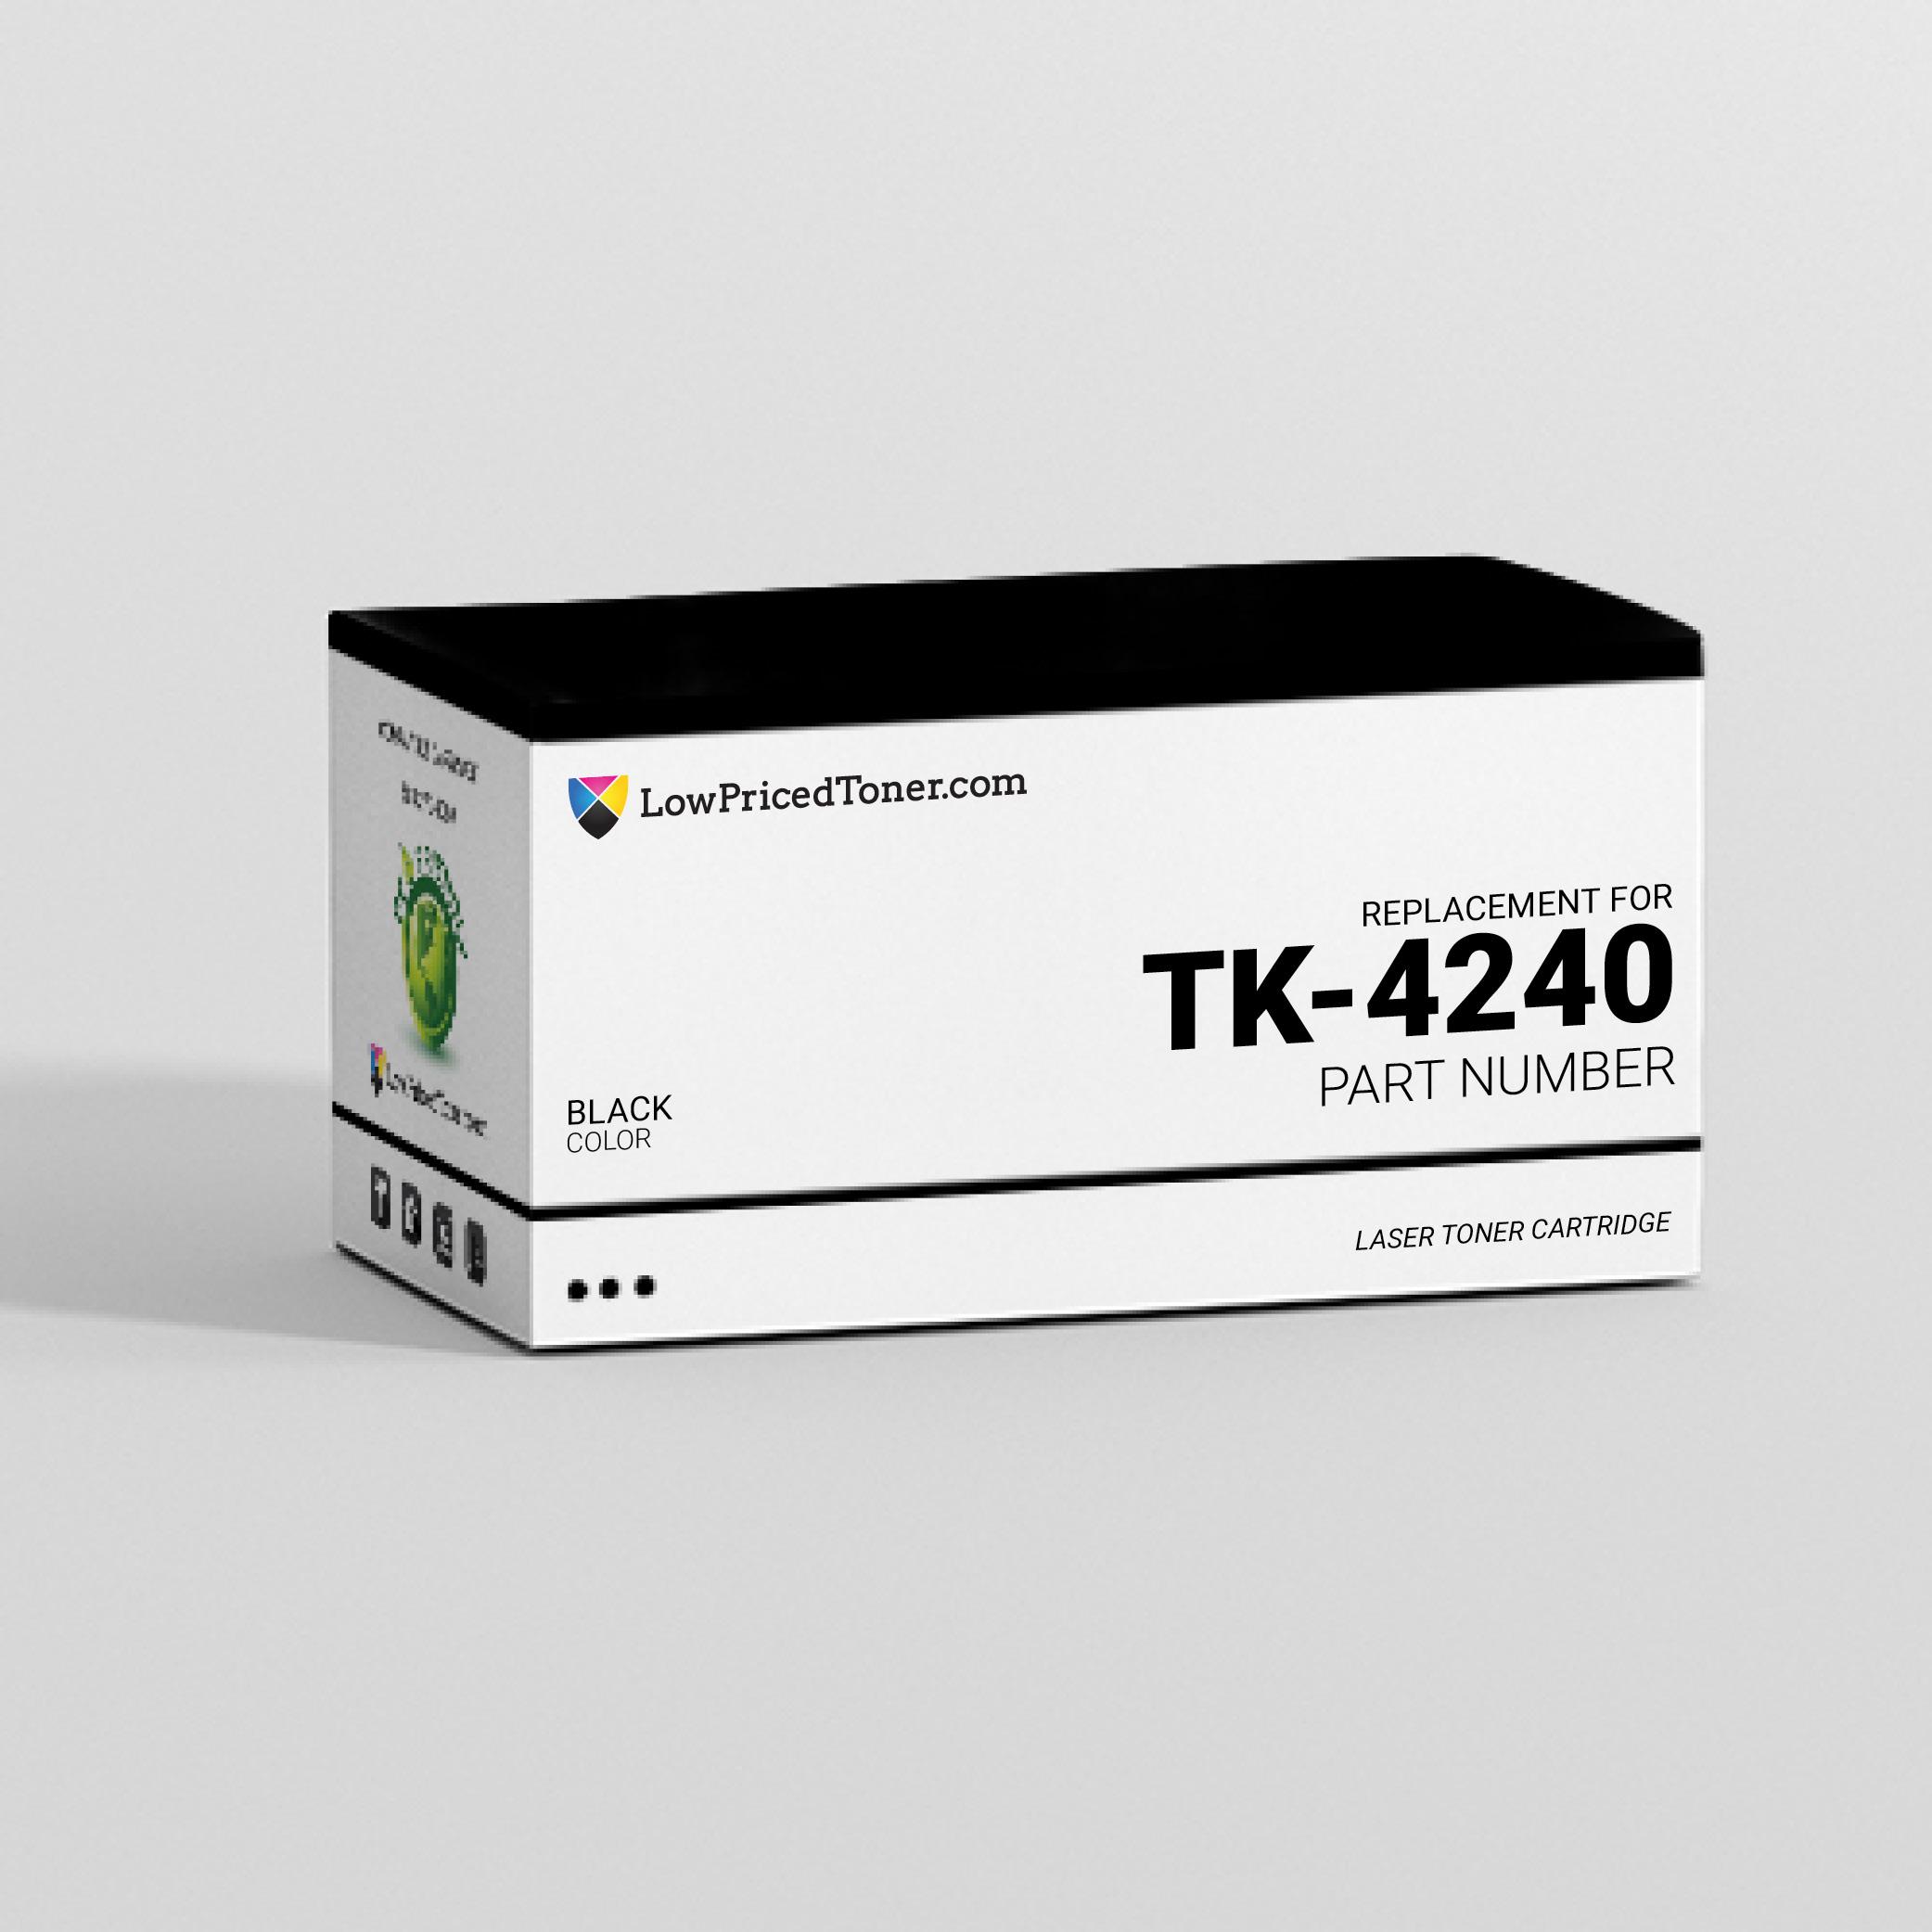 Triumph Adler and Utax TK-4240 Compatible Black Laser Toner Cartridge